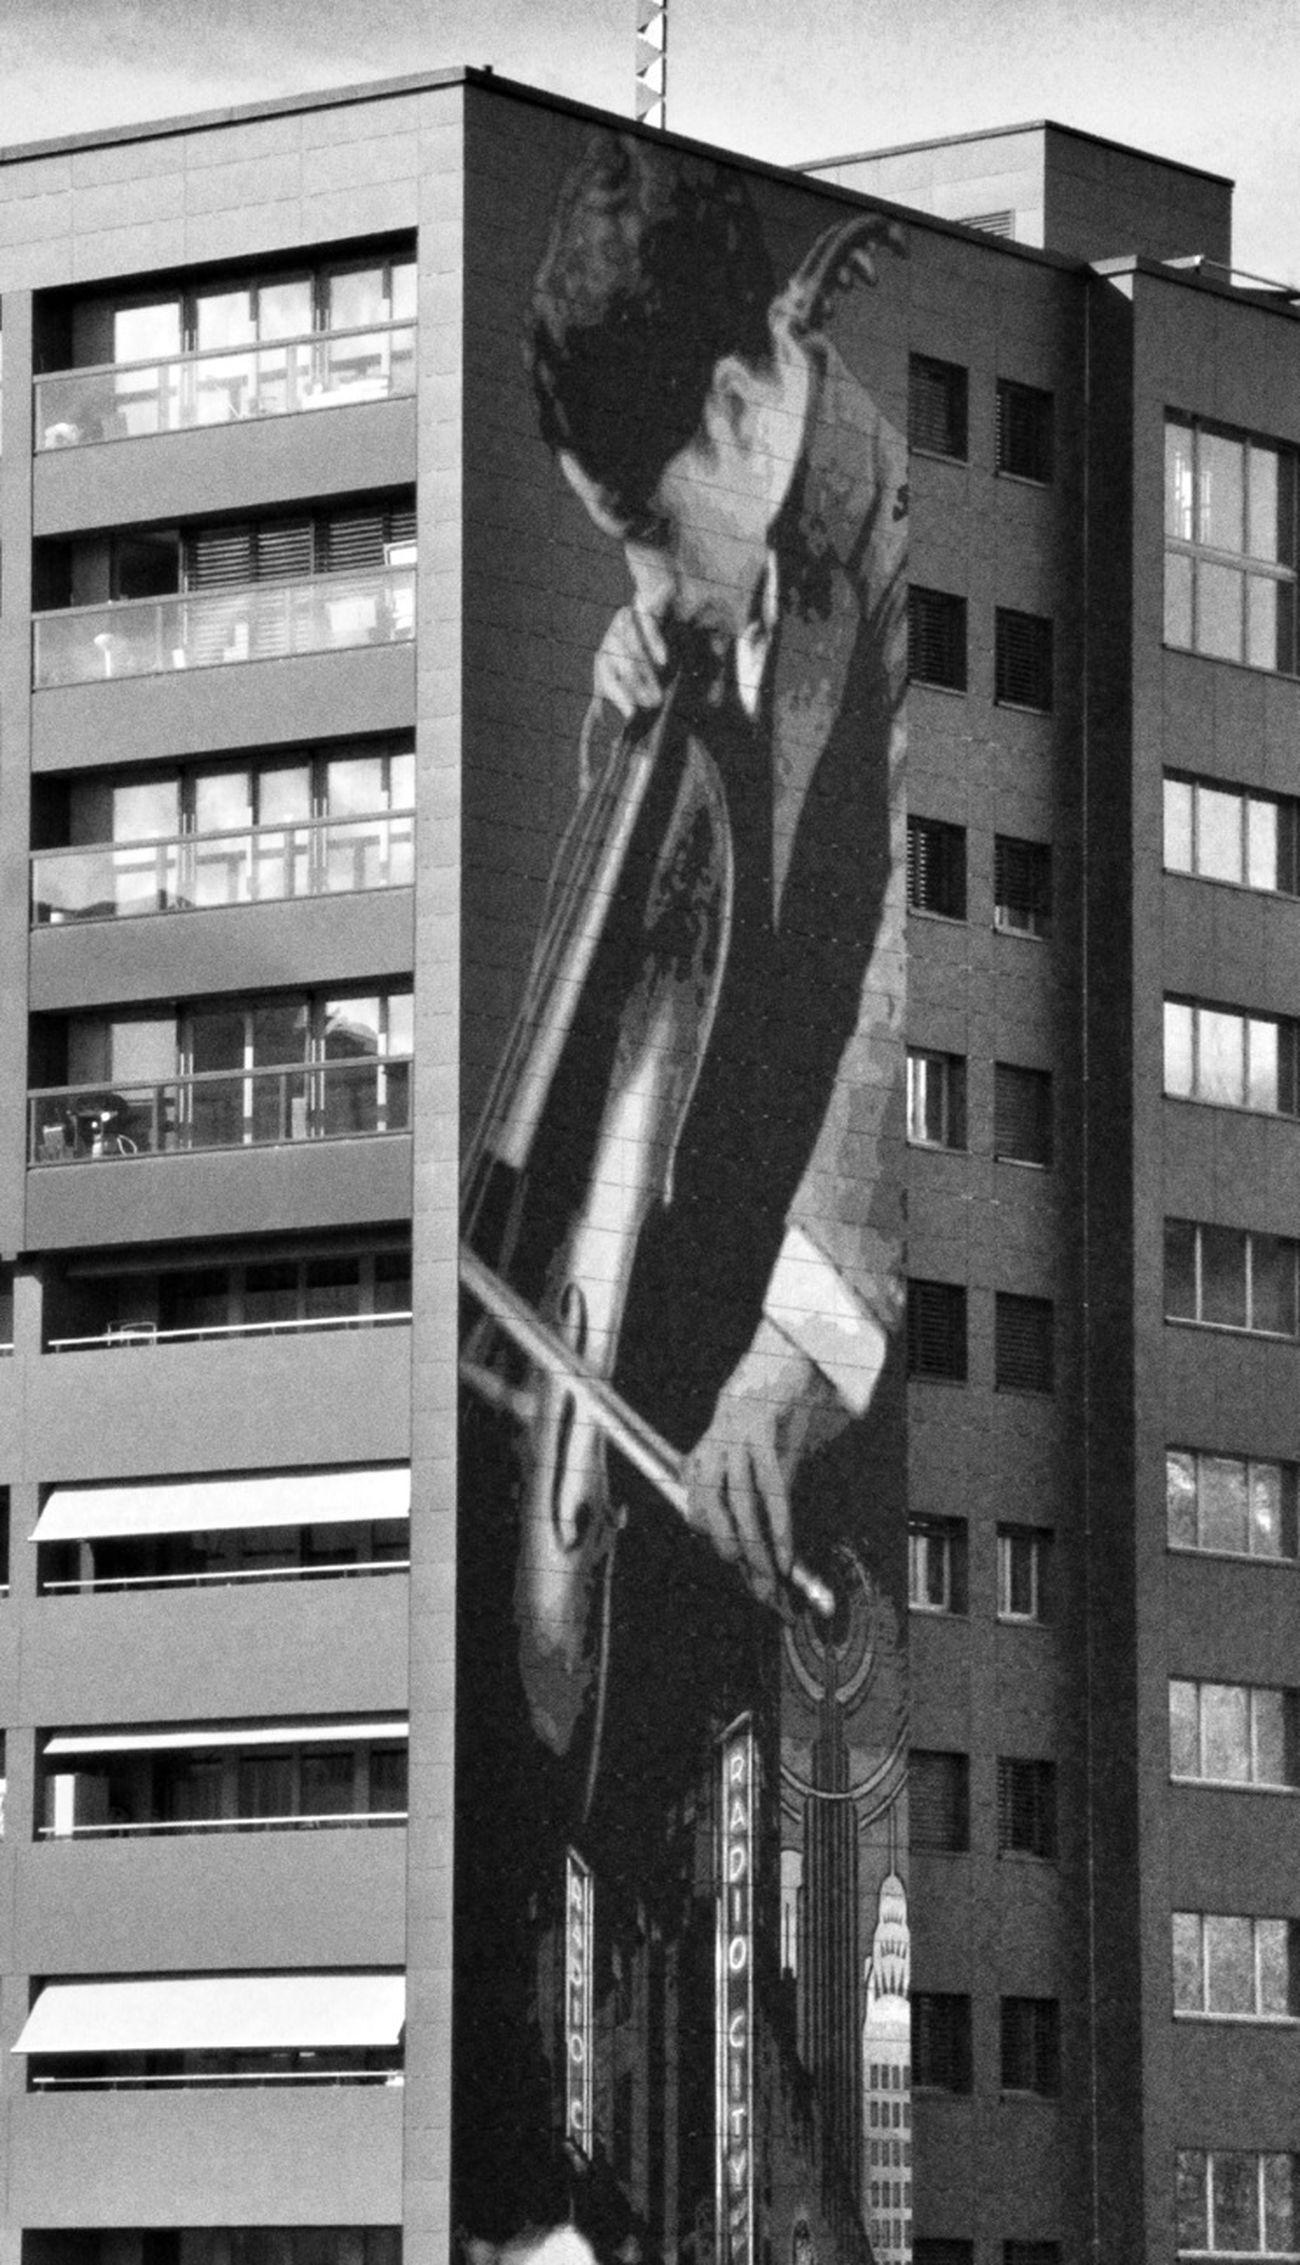 Charlie Chaplin On The Wall